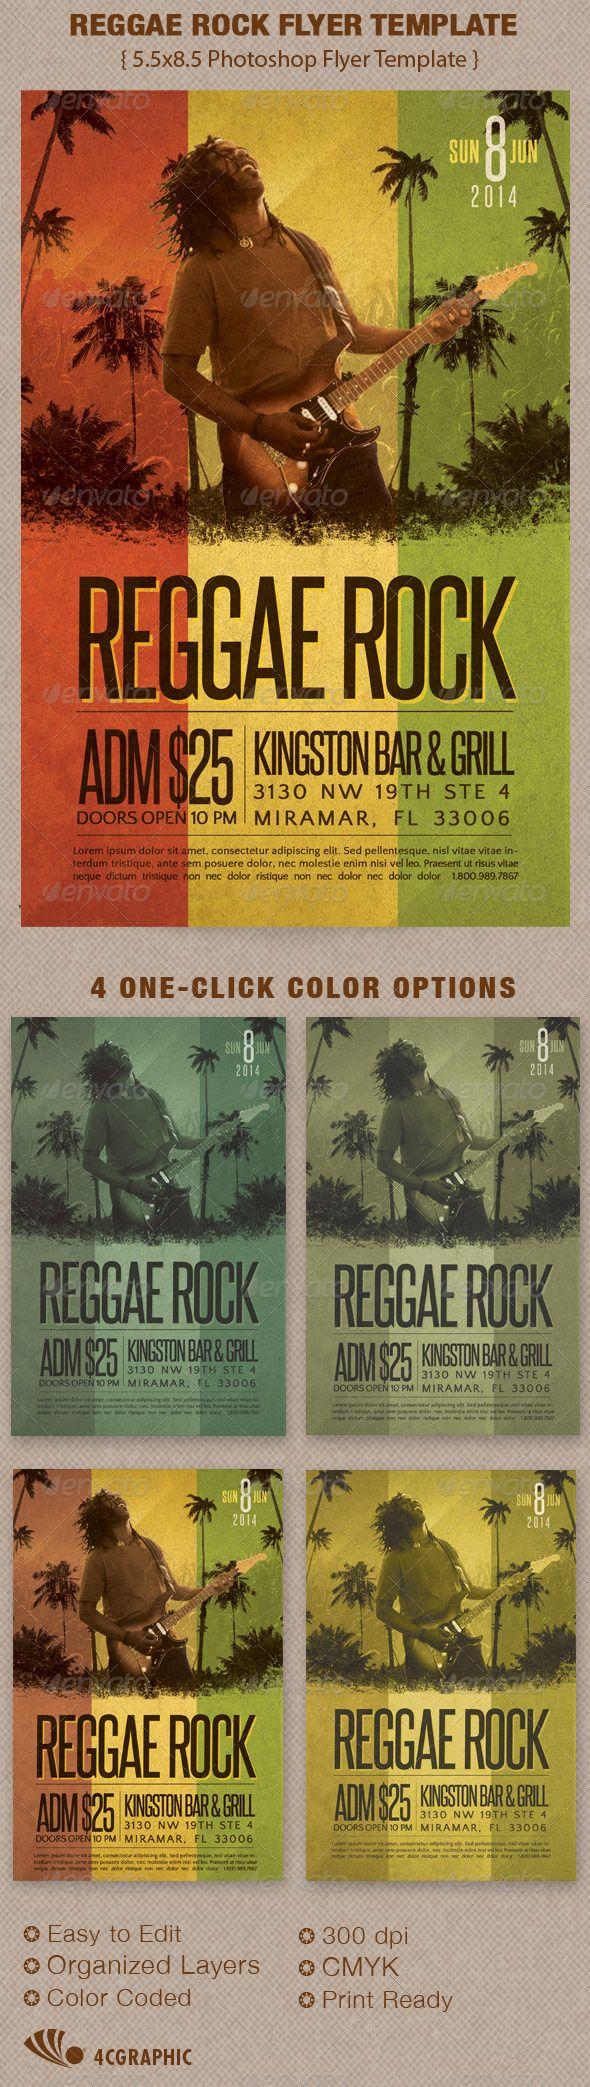 70s poster design template - Reggae Rock Flyer Template